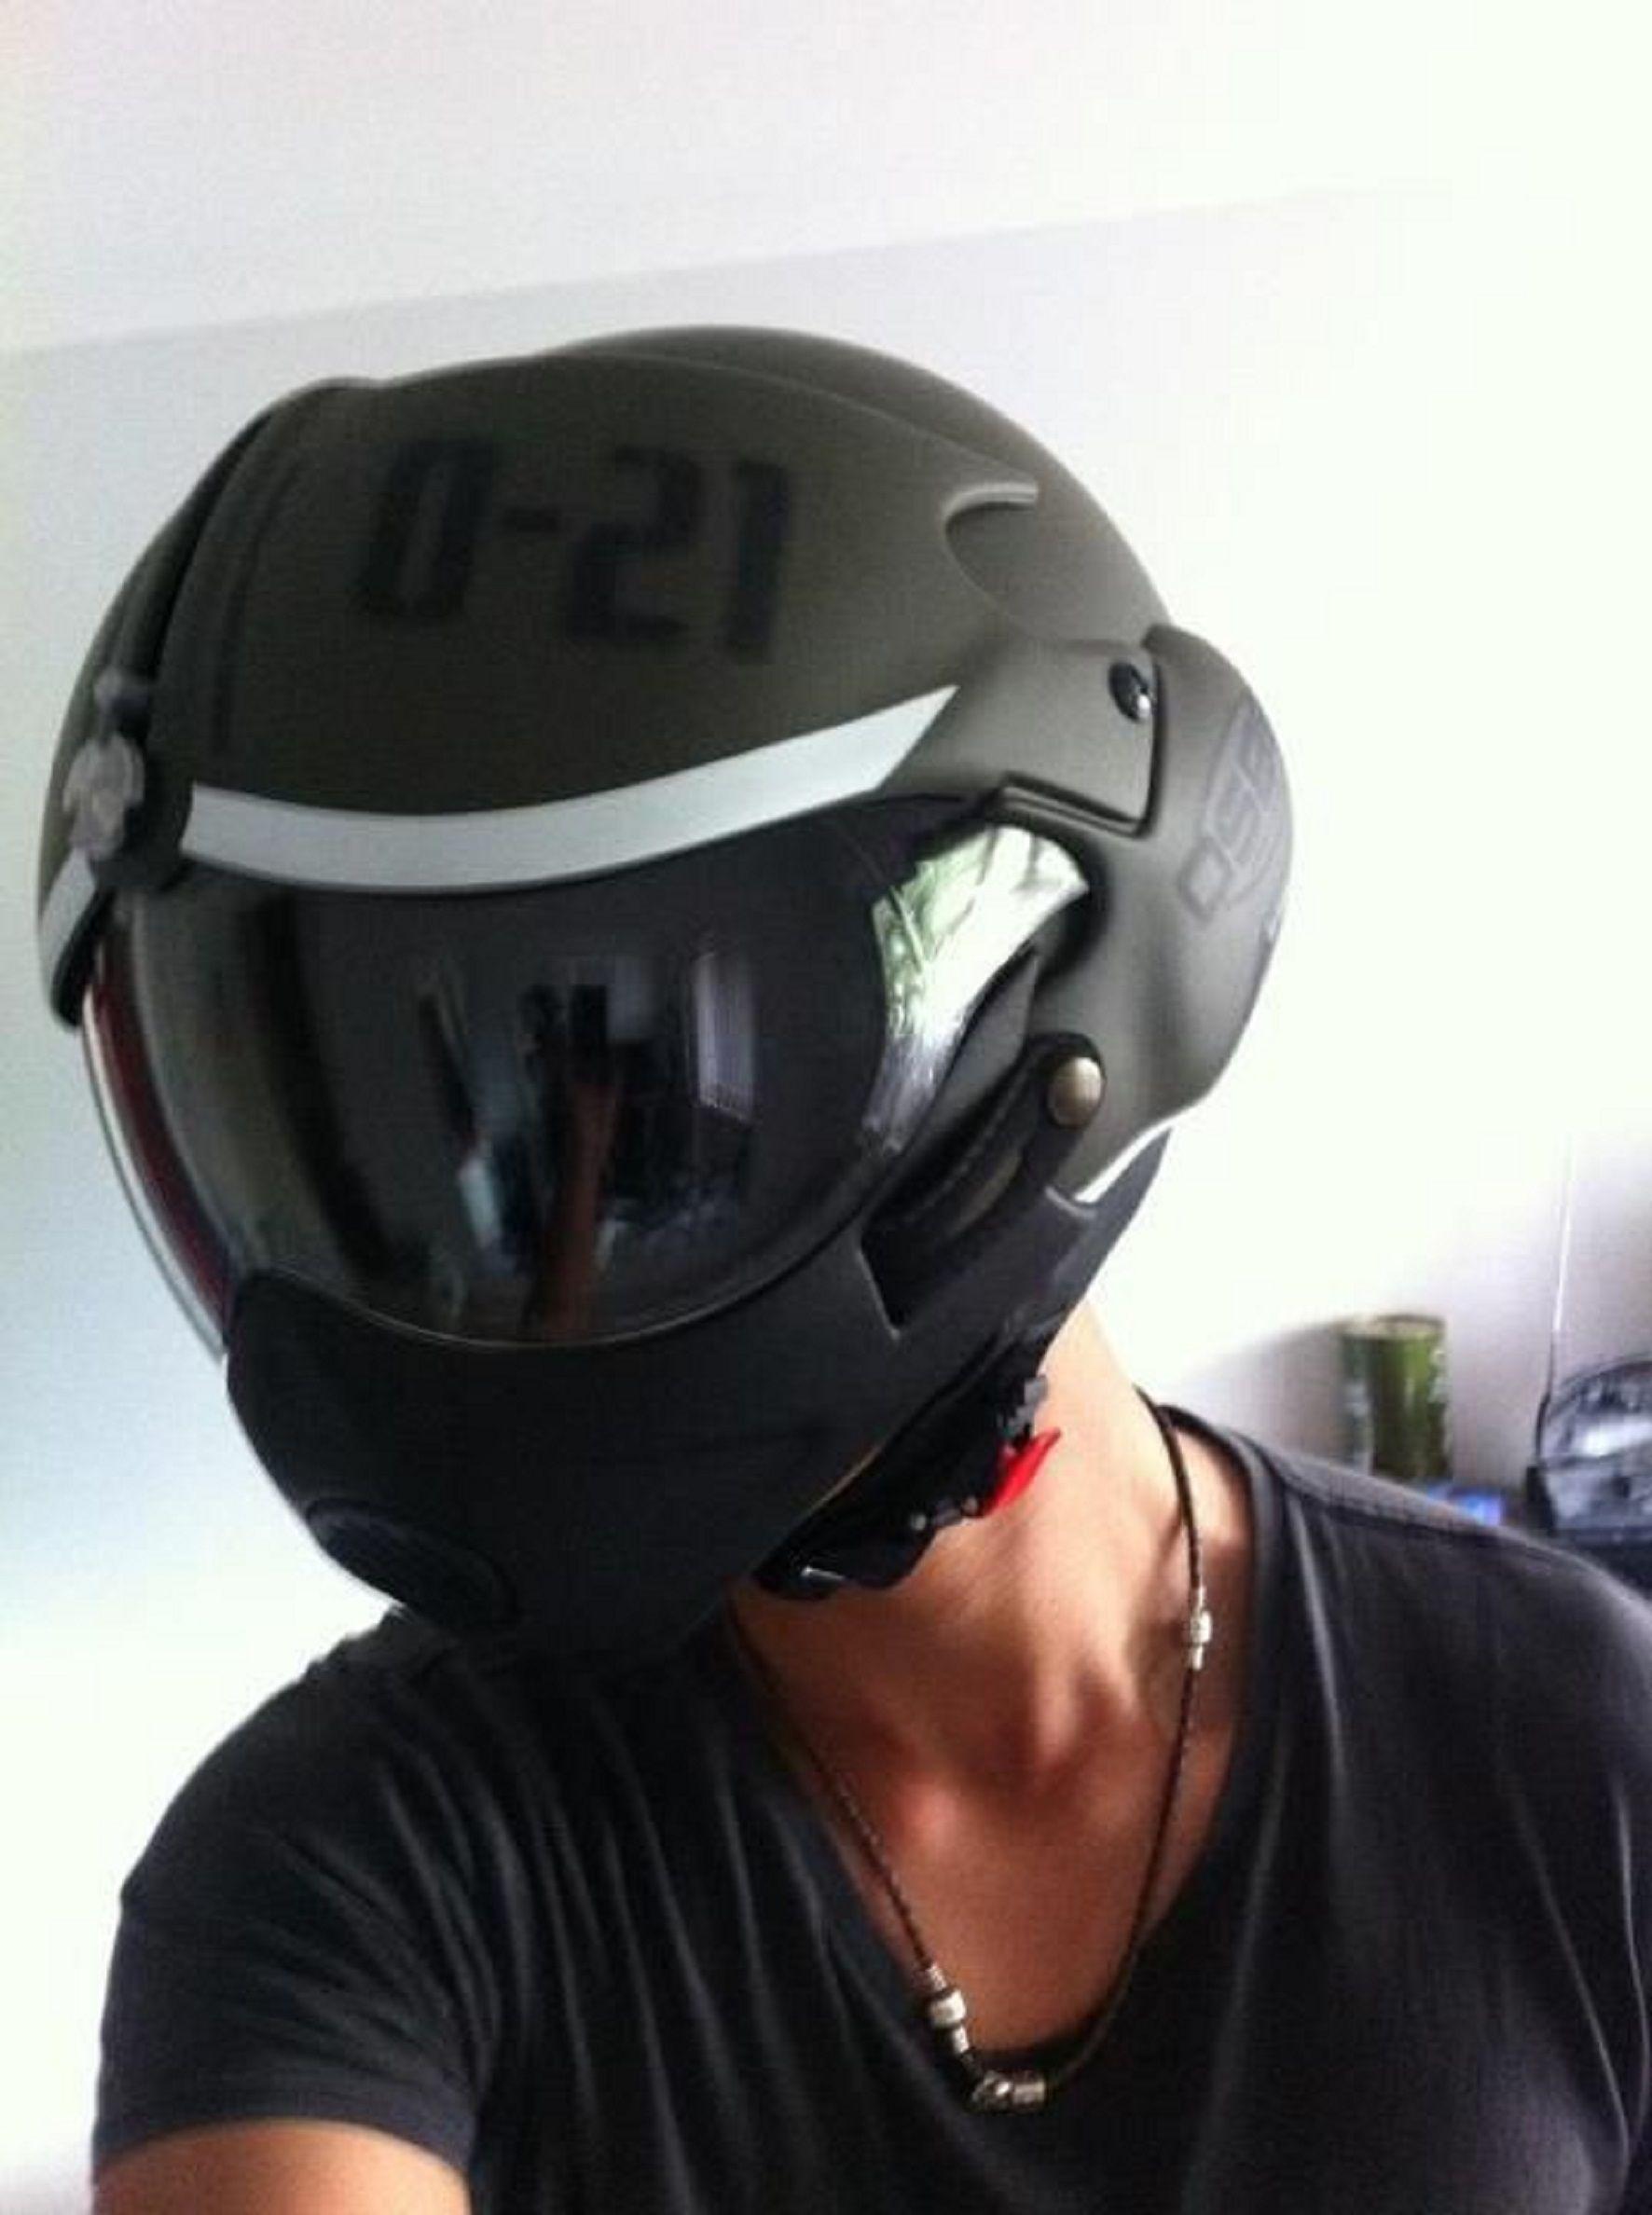 Osbe Tornado Helmet Http Designerhelmets Com Shop Helmets Brand